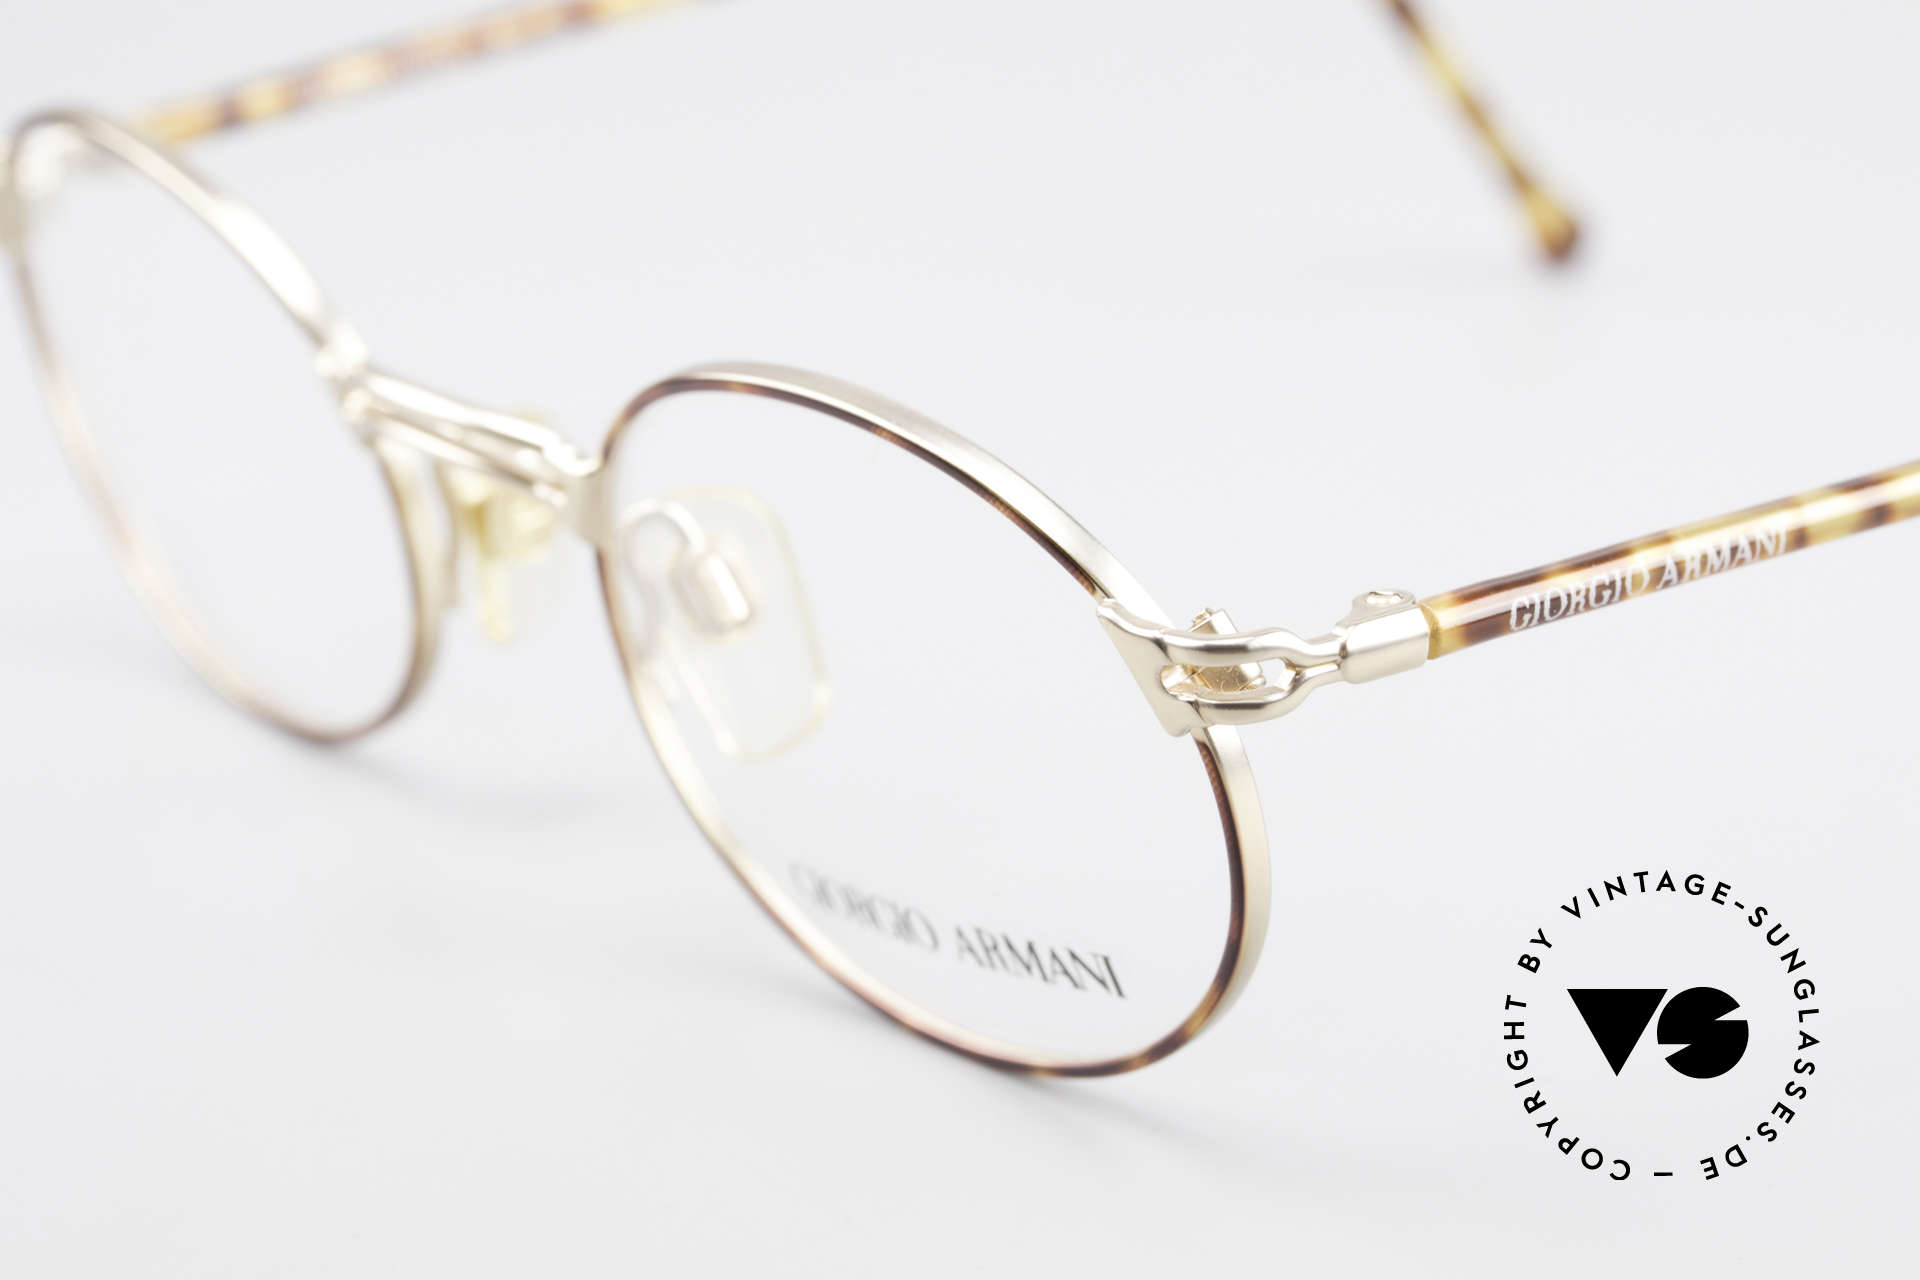 Giorgio Armani 194 Oval 90s Eyeglasses No Retro, unworn rarity (like all our rare vintage GA eyewear), Made for Men and Women